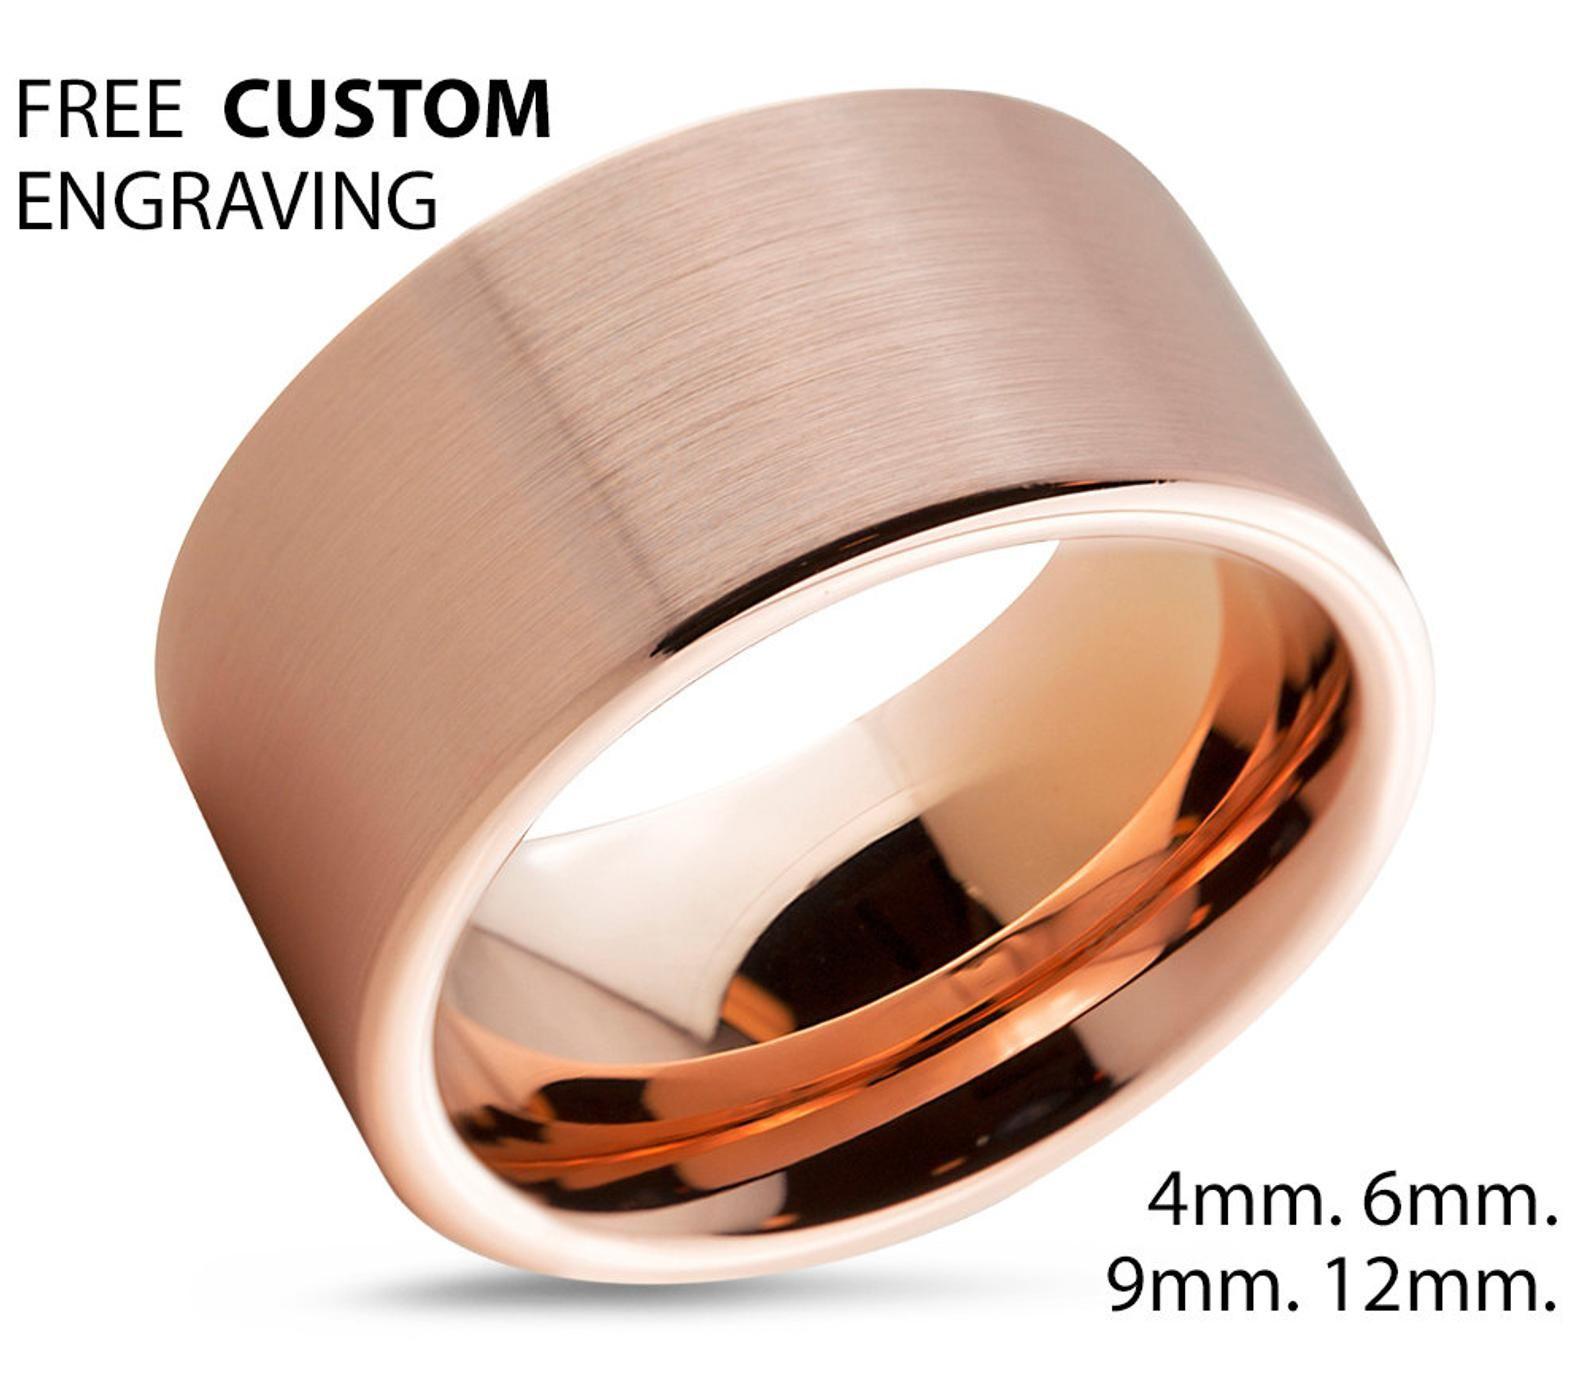 Mens Wedding Band, Tungsten Ring Rose Gold 18K 12mm